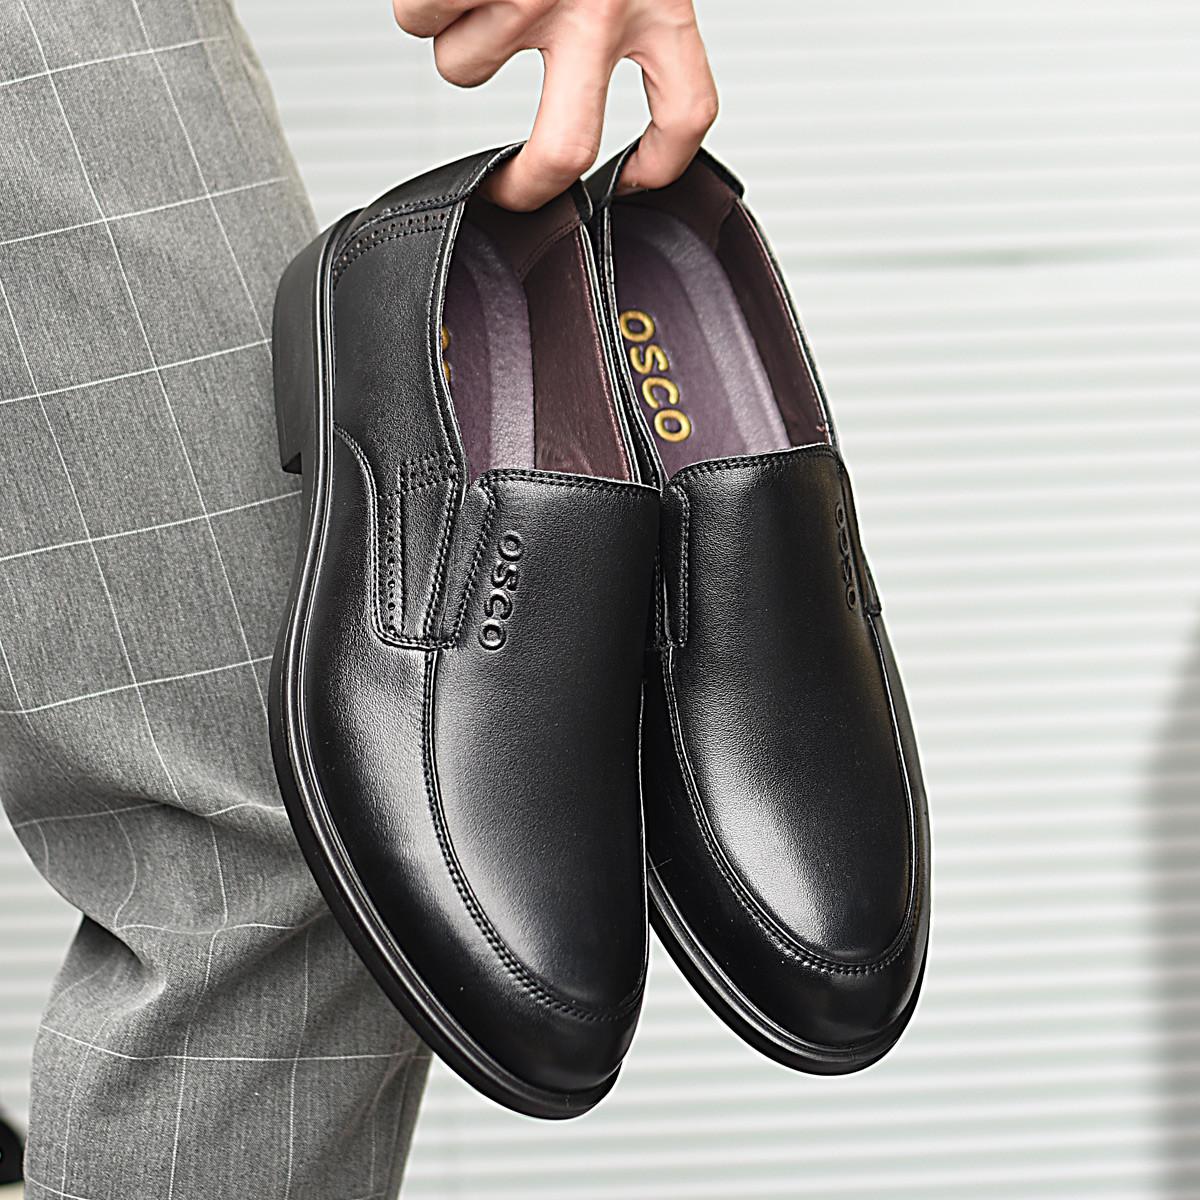 OSCO商务正装牛皮圆头套脚真皮一脚蹬男鞋男皮鞋男皮鞋男鞋男休闲鞋S4811BL